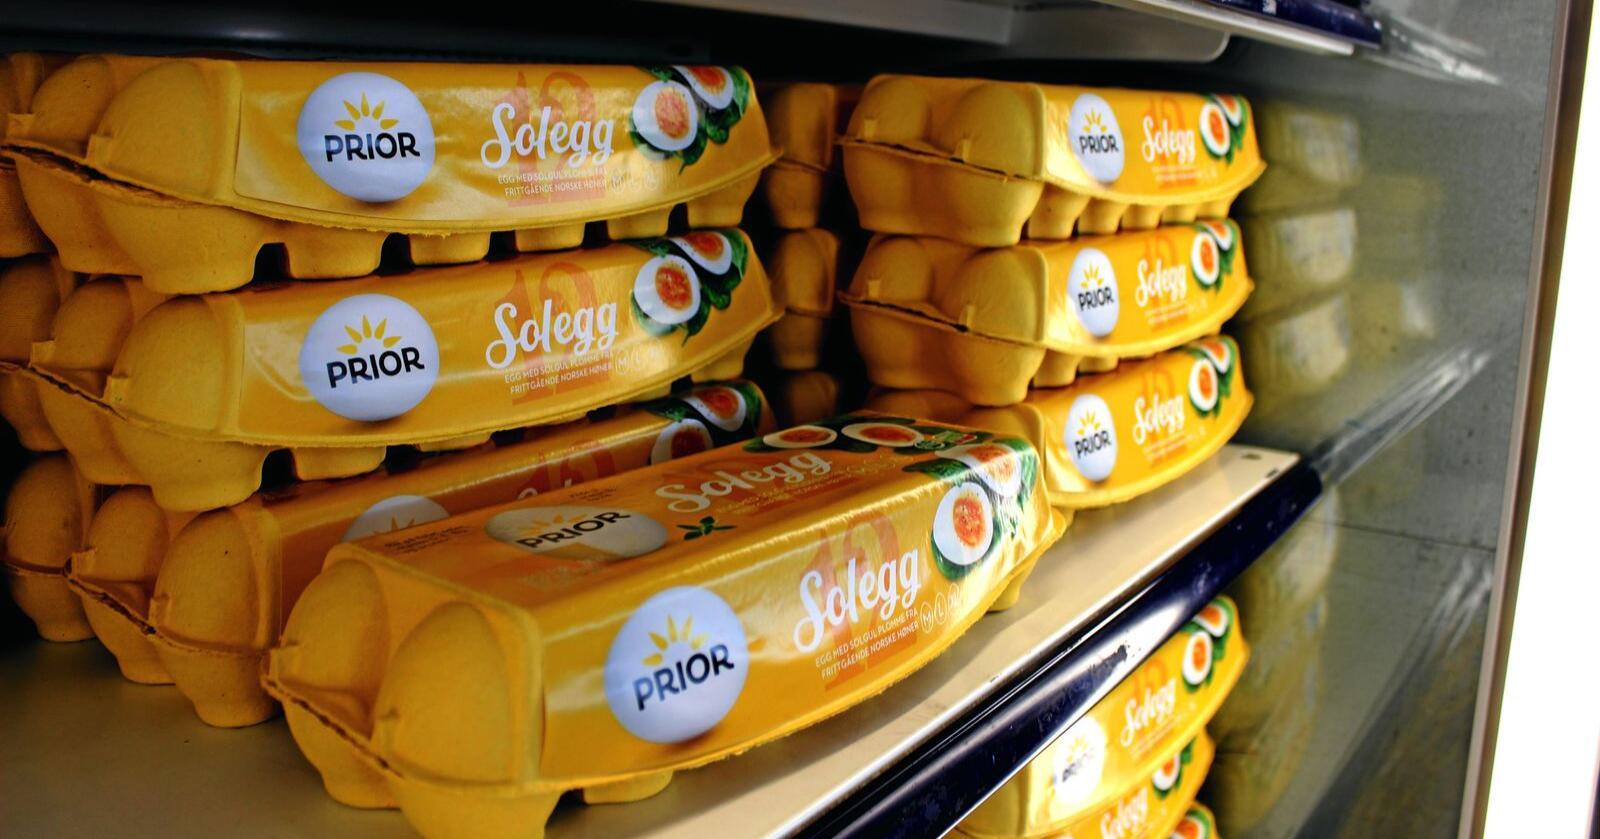 I påske spiser vi normalt 25 millioner egg. Foto: Jon-Fredrik Bækgaard Klausen